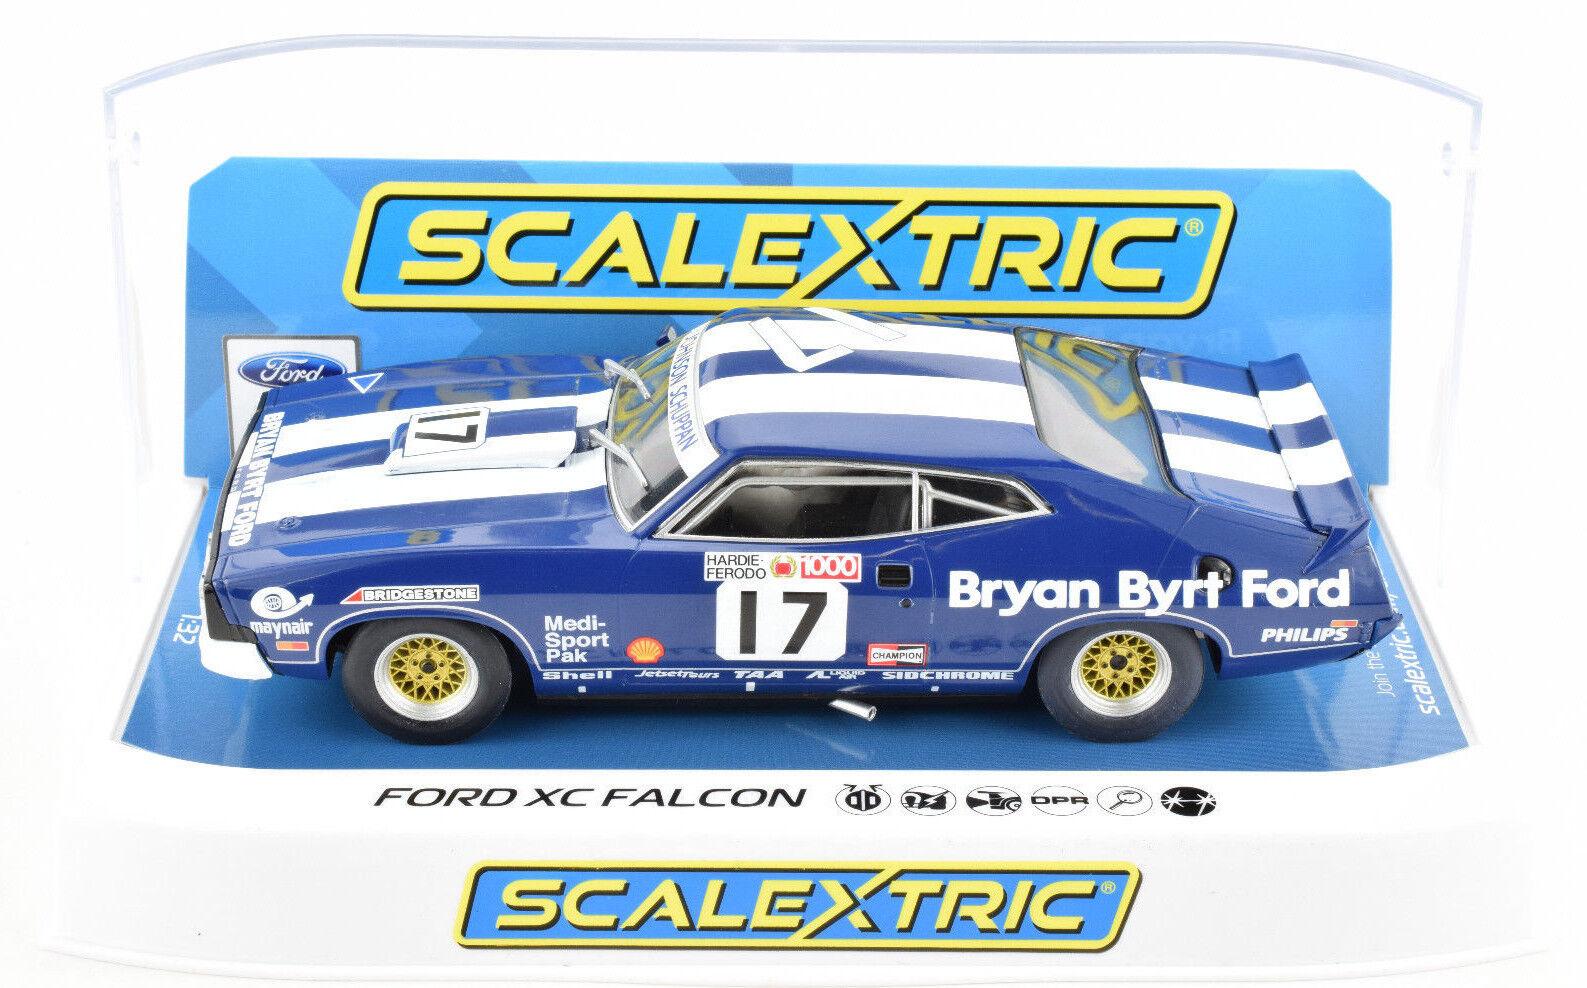 Scalextric  Bryan Byrt ford  Ford XC Falcon DPR W  Lights 1 32 Slot Car C3923